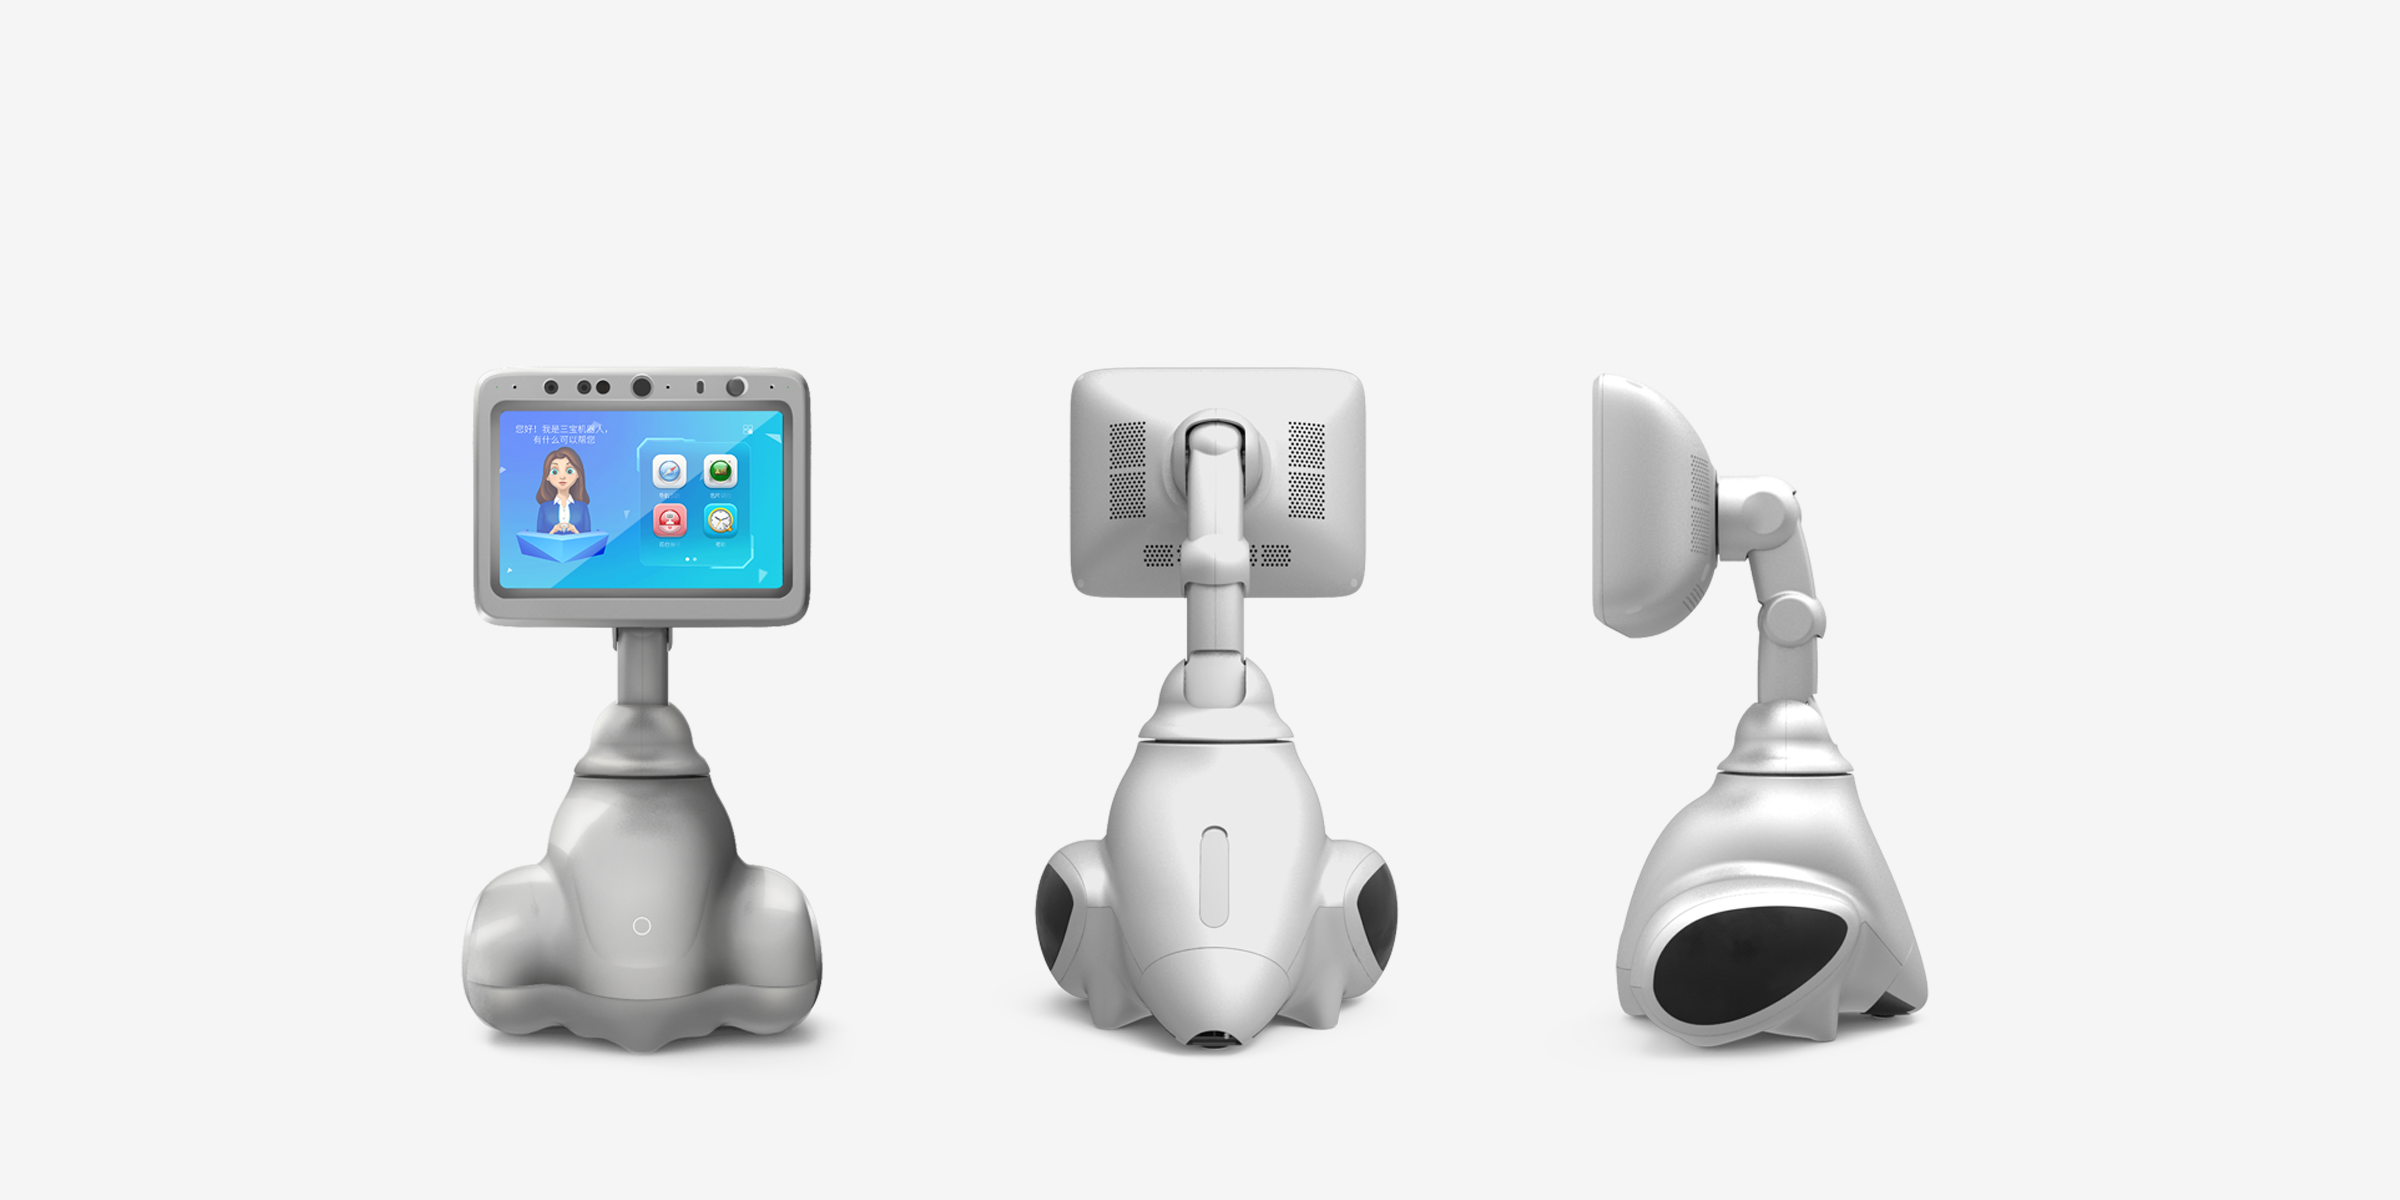 humanoid robot, advanced humanoid robot, humanoid service robot